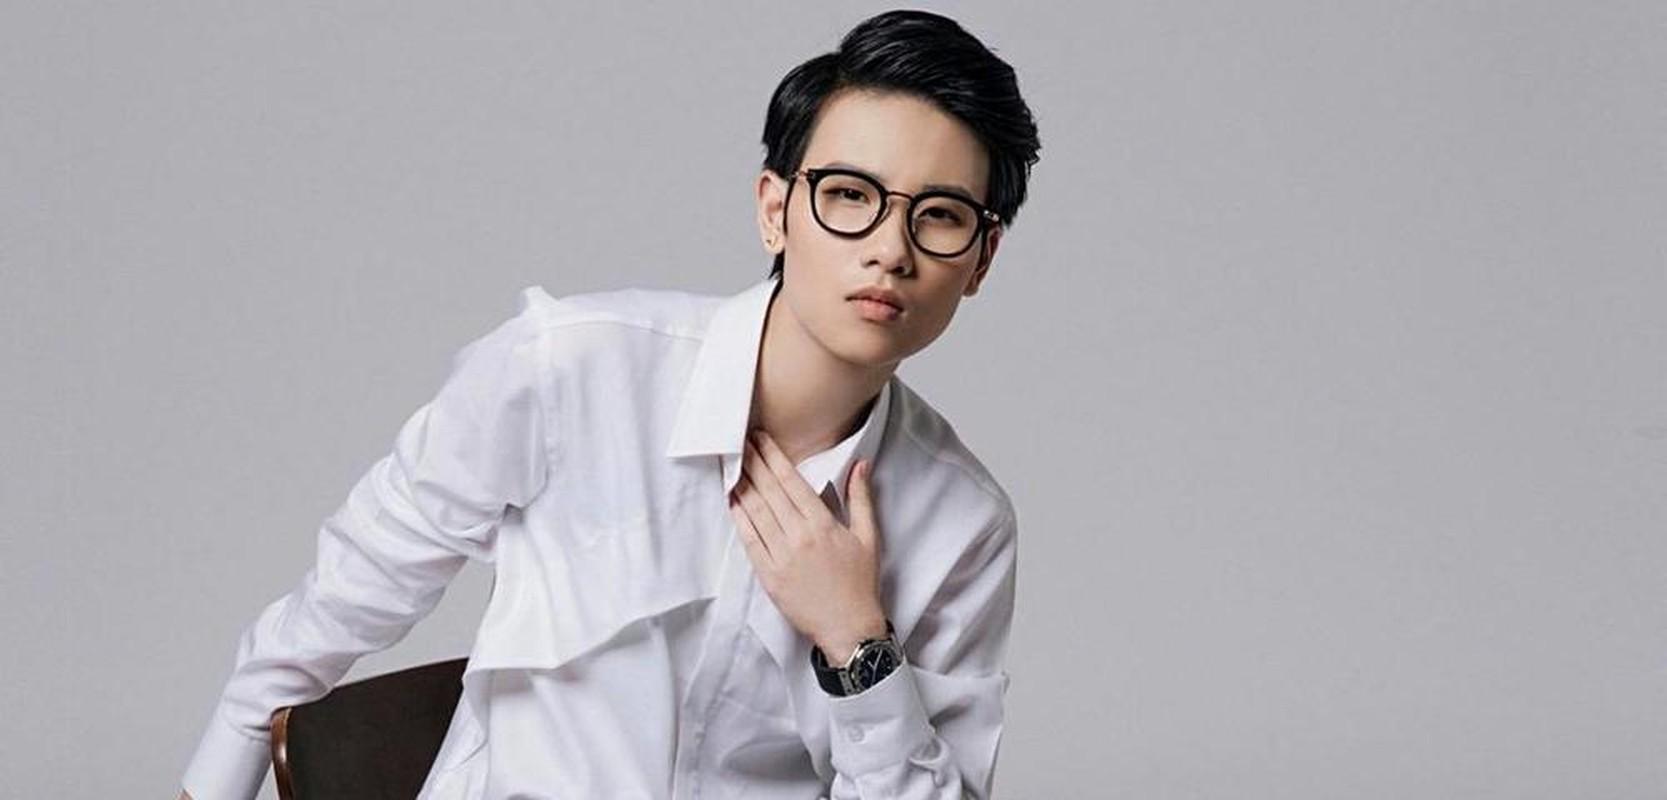 My nhan Viet phat ngon gay tranh cai du doi: Noi ho hay co tinh gay soc?-Hinh-4